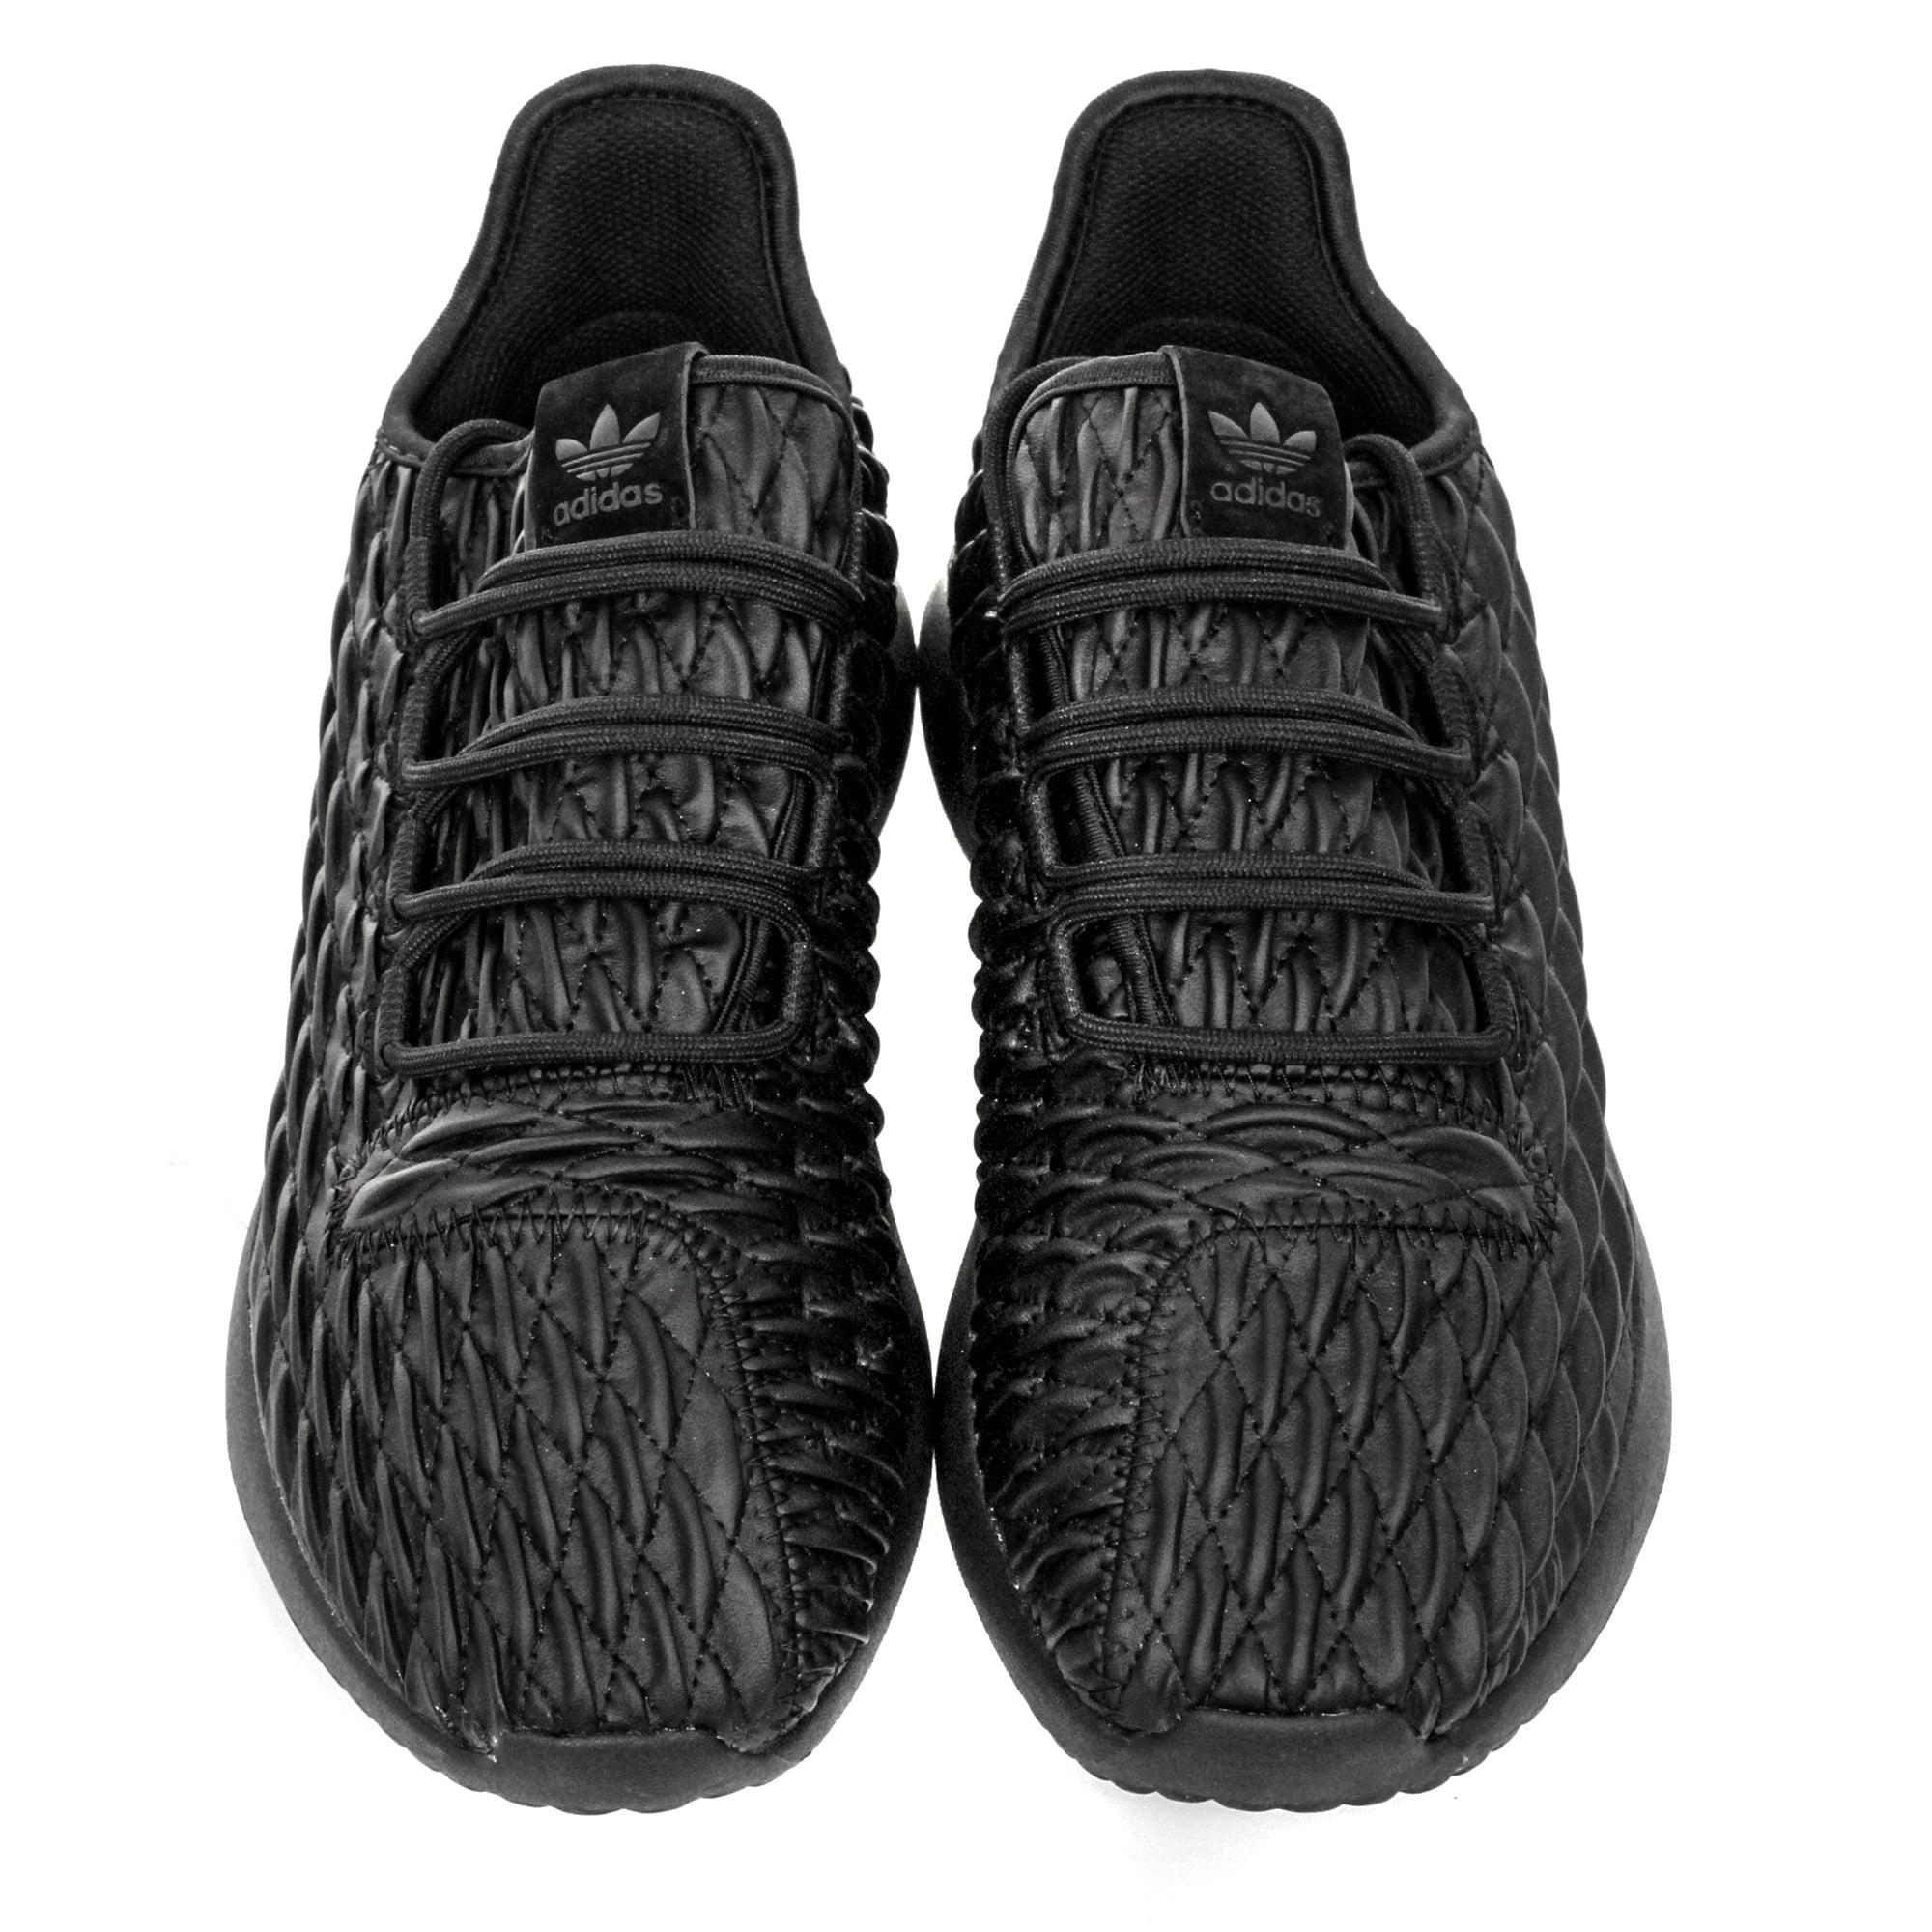 adidas originals tubular shadow trainers in black bb8819